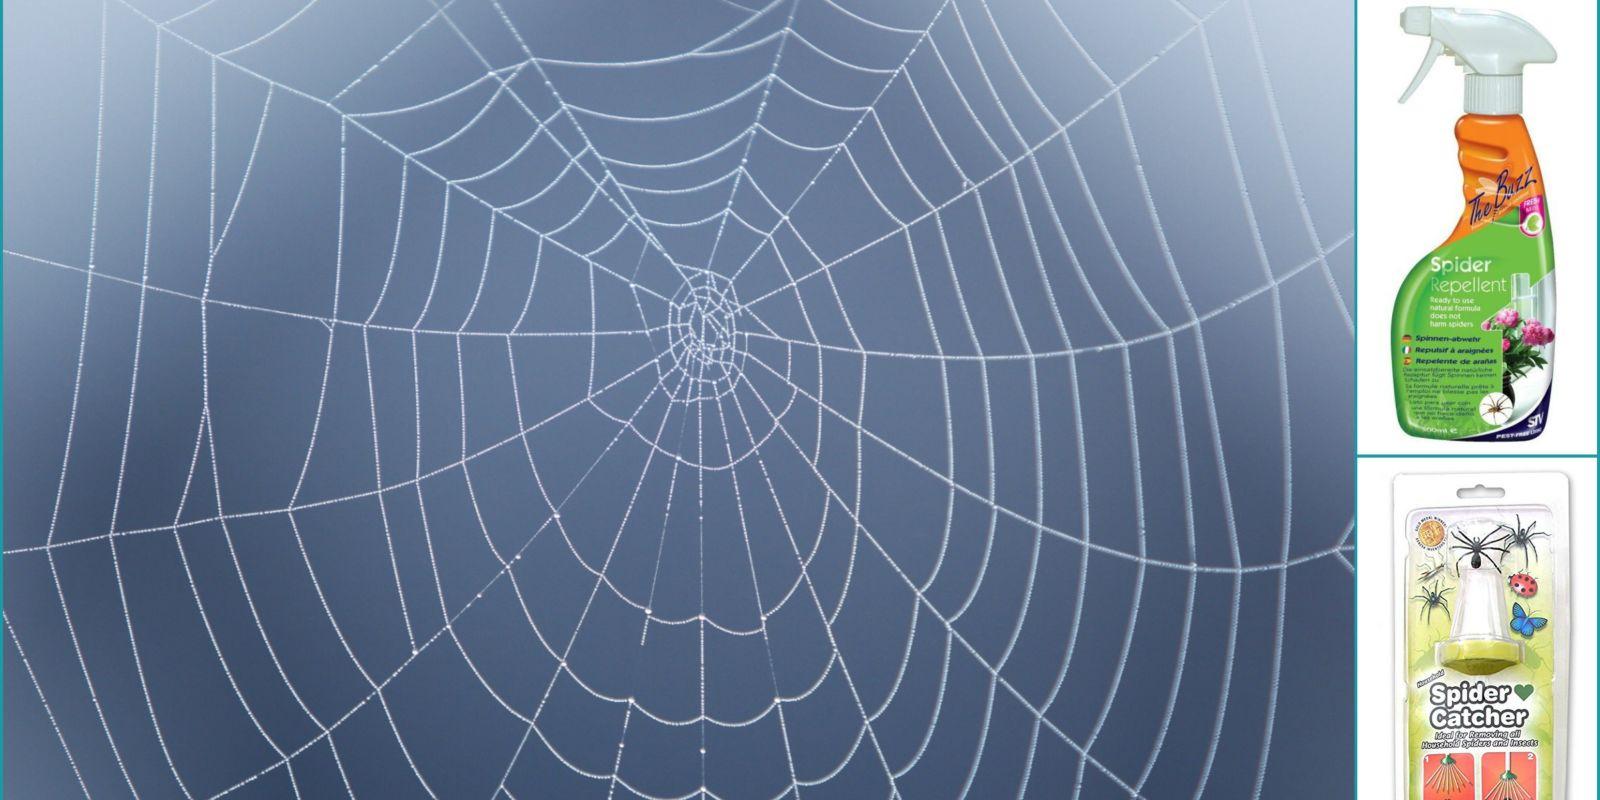 Best Spider Repellents These Natural Spider Deterrents